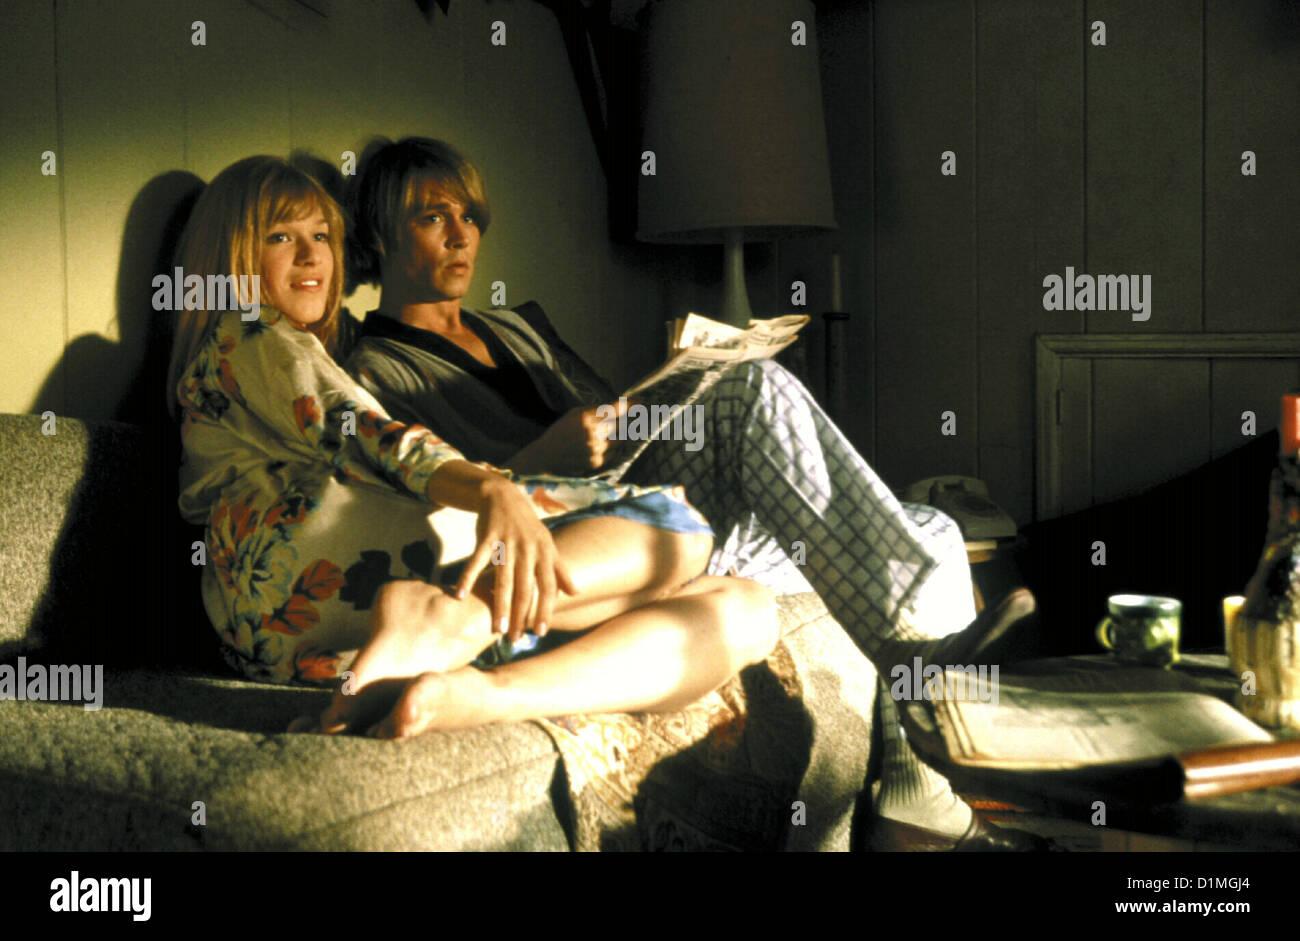 Blow   Blow   Franka Potente, Johnny Depp *** Local Caption *** 2001  Kinowelt Stock Photo